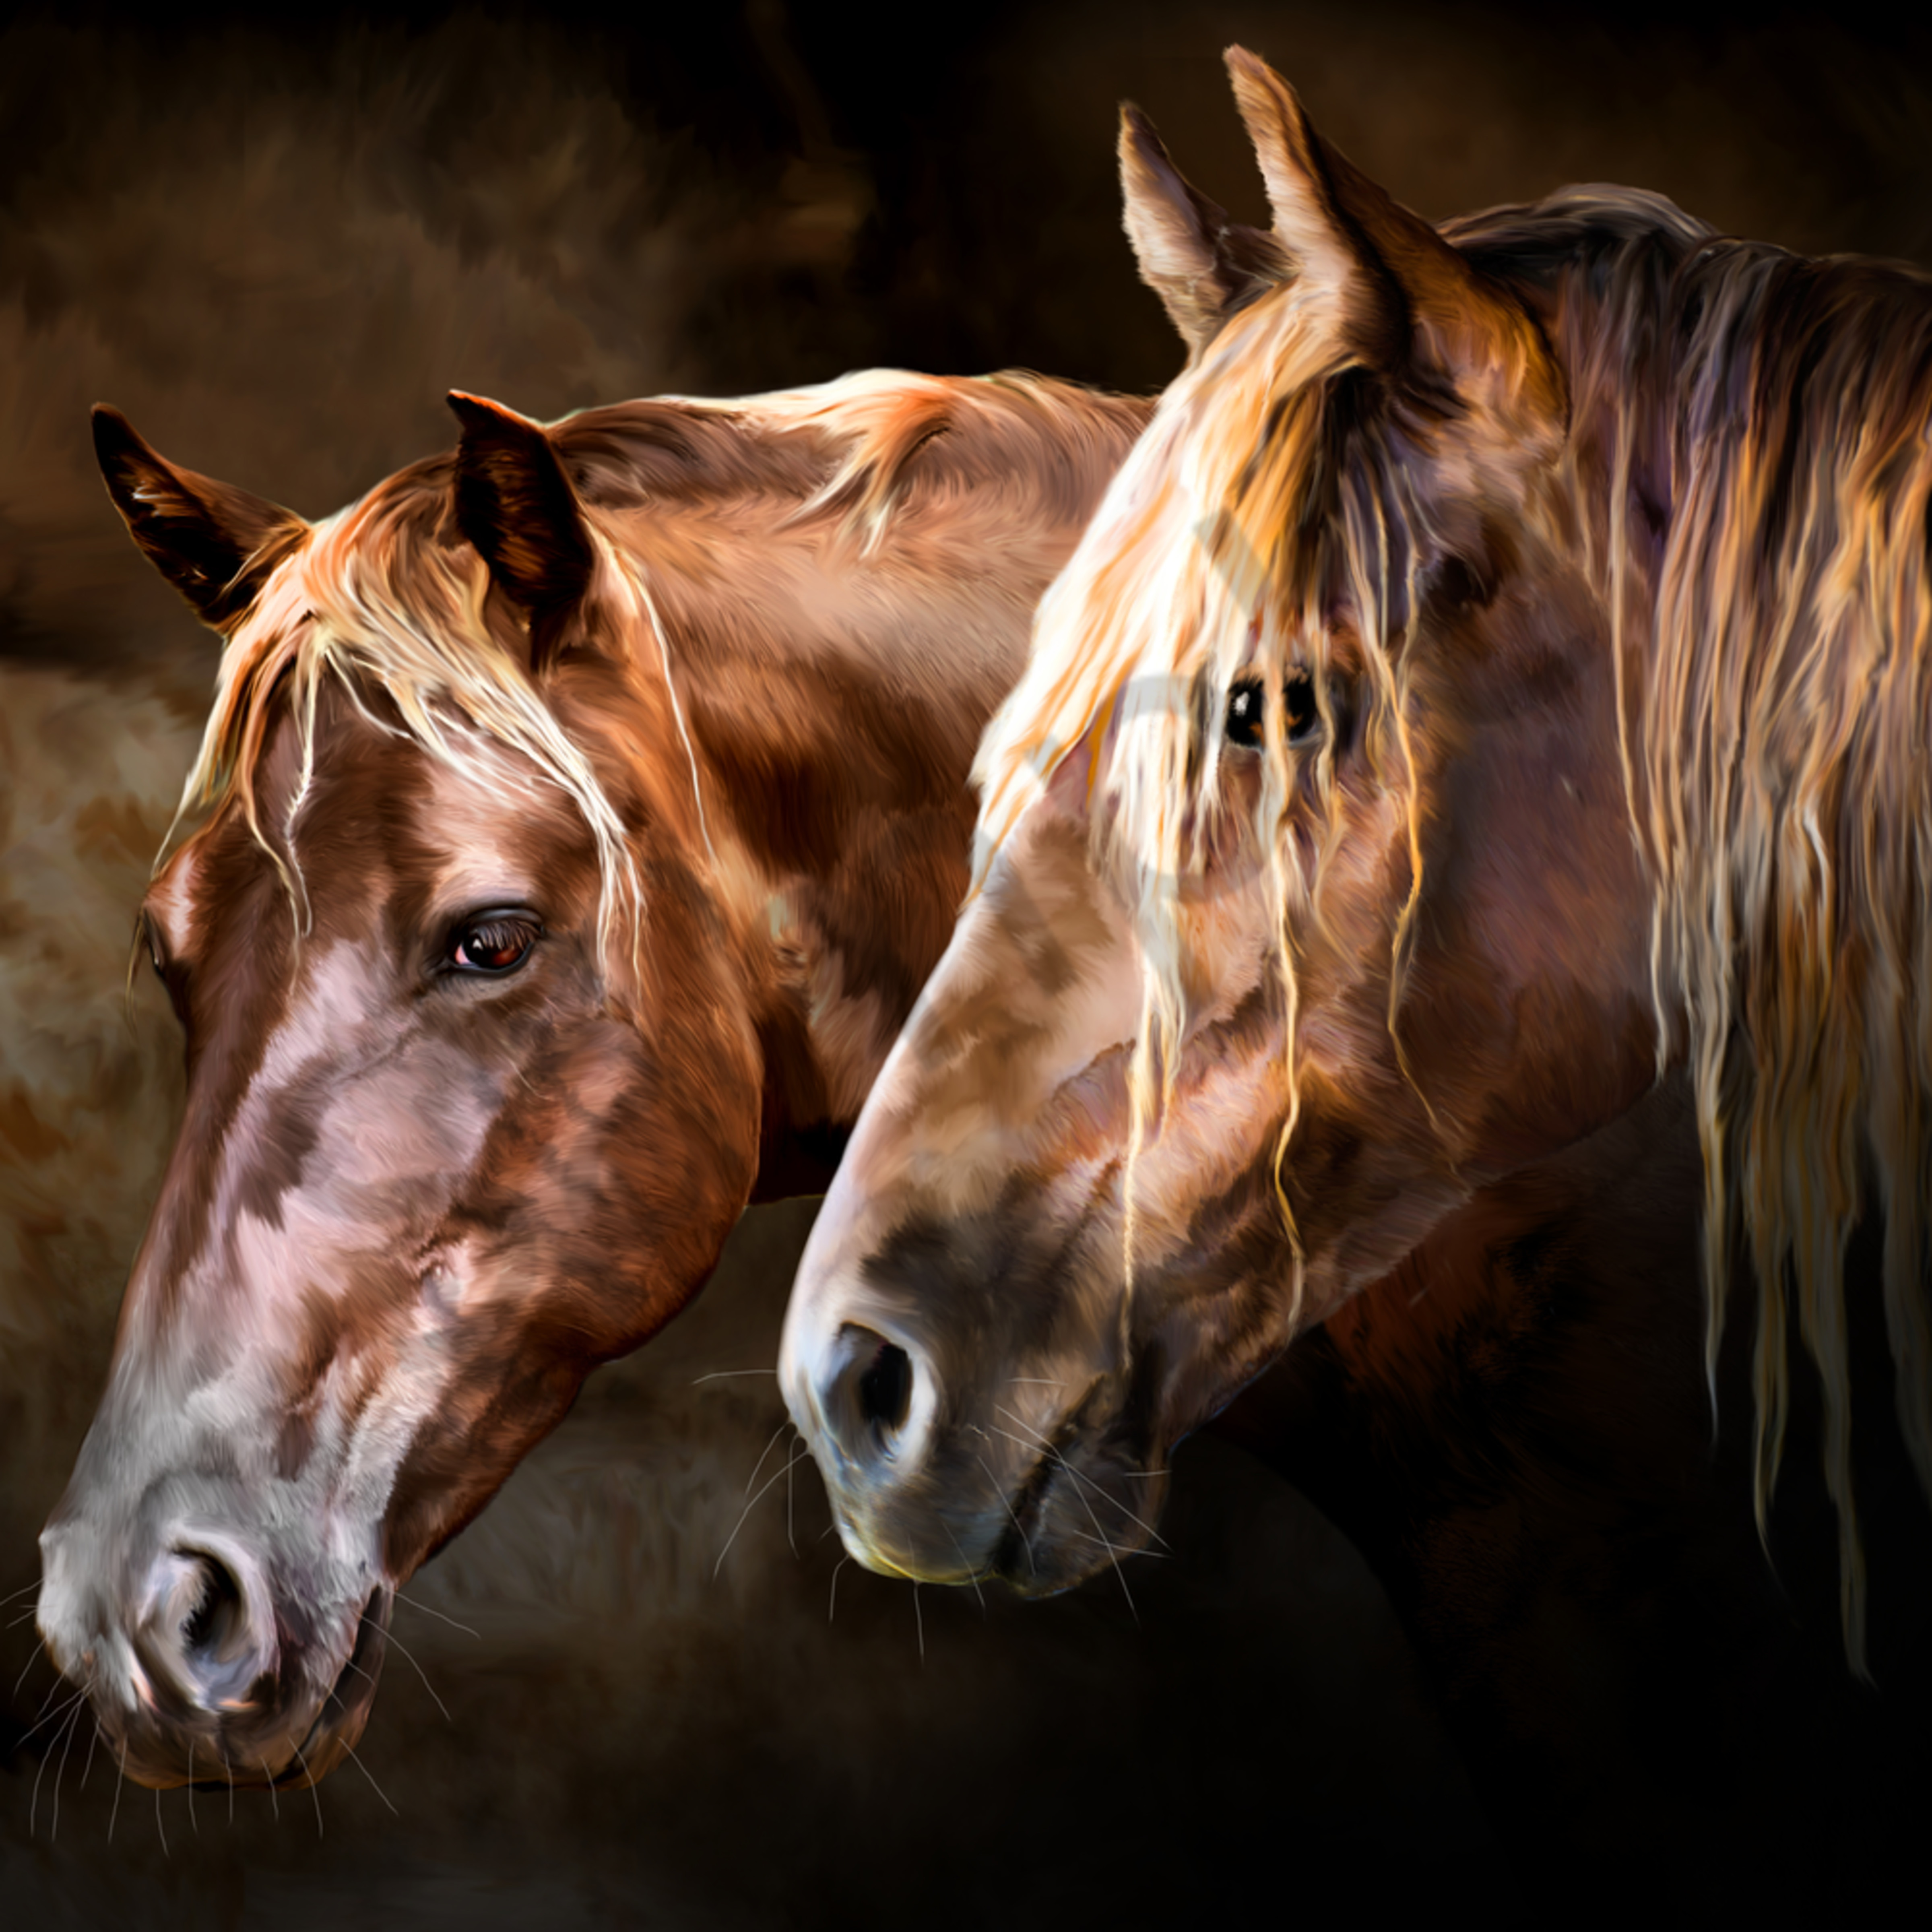 Horses m1v3kp